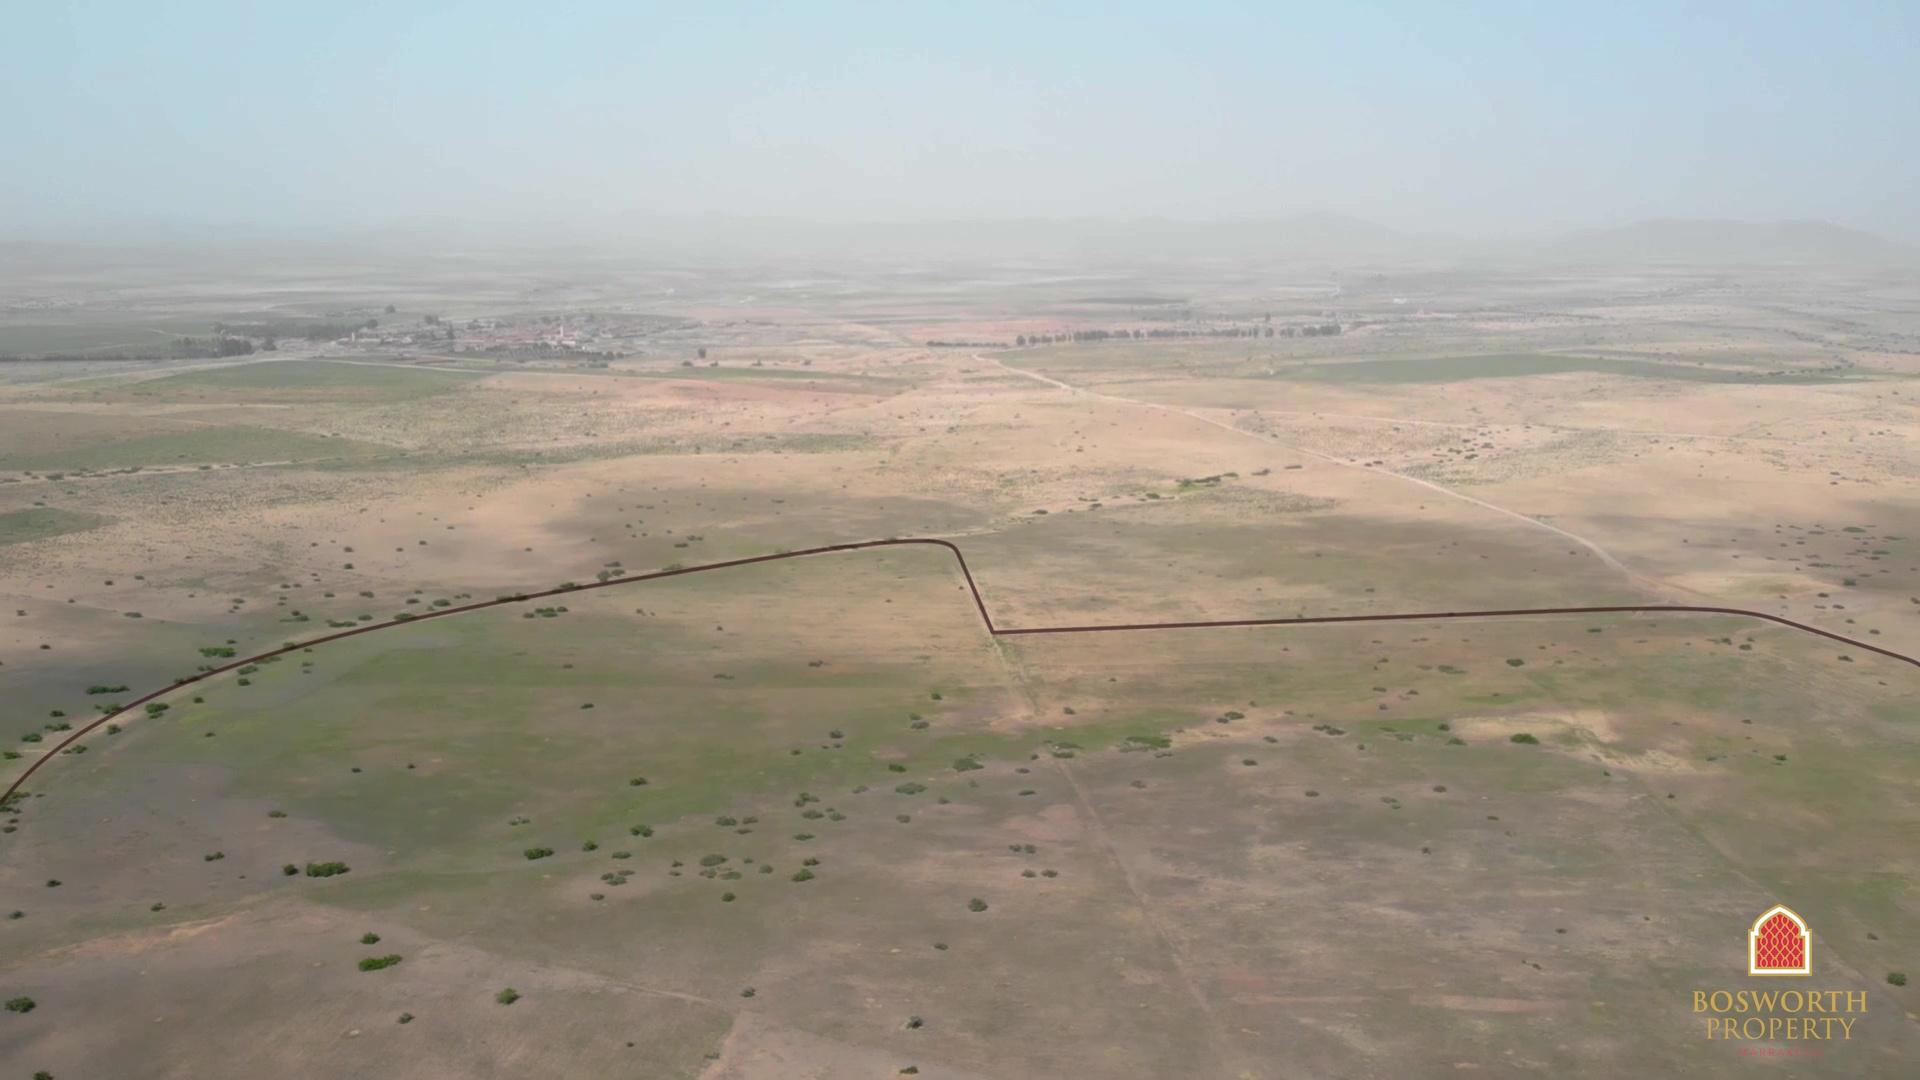 70 hectares building land for sale Marrakech - Marrakech Real Estate - Marrakech Property - immobilier marrakech - terrain a vendre marrakech